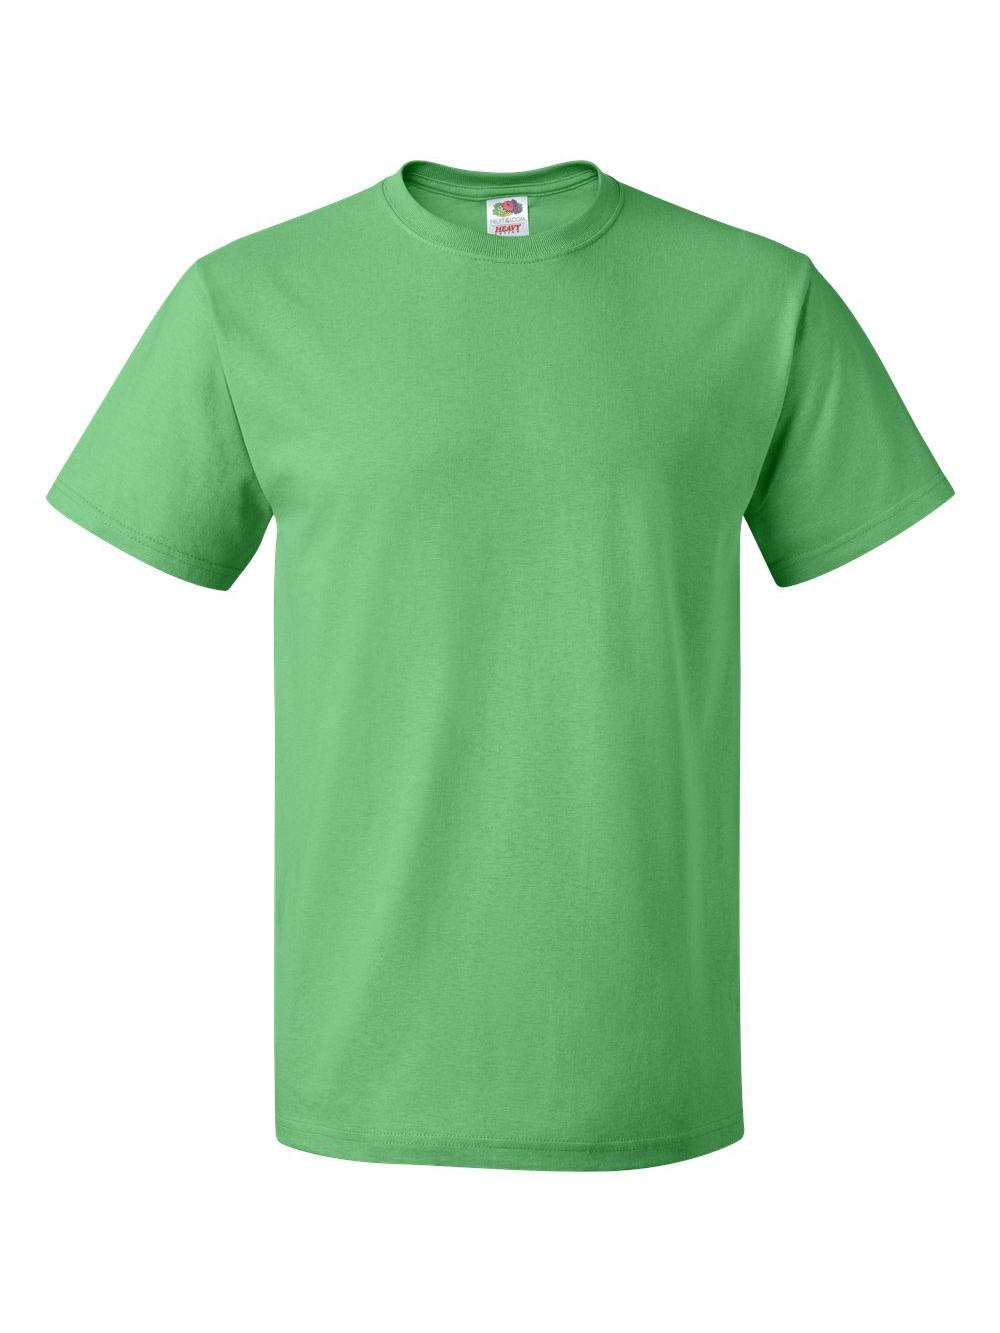 Fruit-of-the-Loom-HD-Cotton-Short-Sleeve-T-Shirt-3930R thumbnail 63